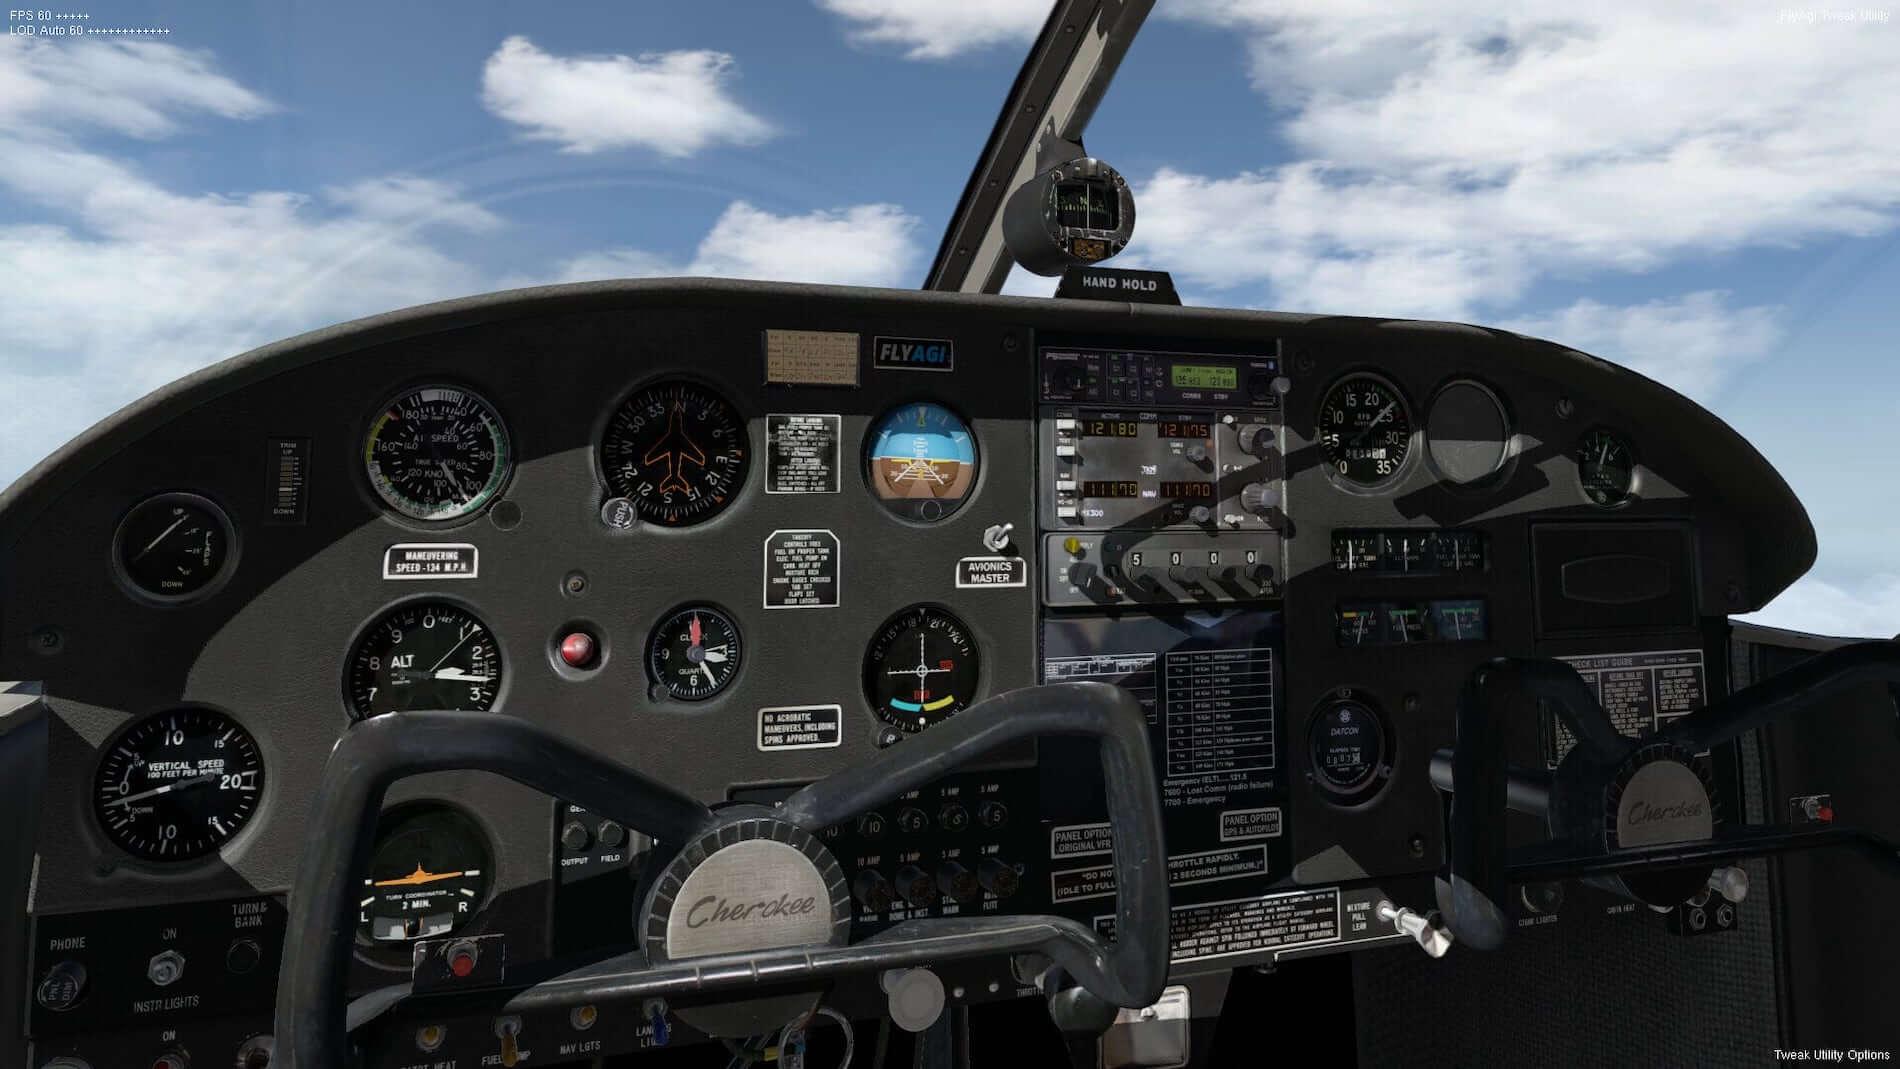 FlyAGI-FTU-Weather-System-ASXP-20